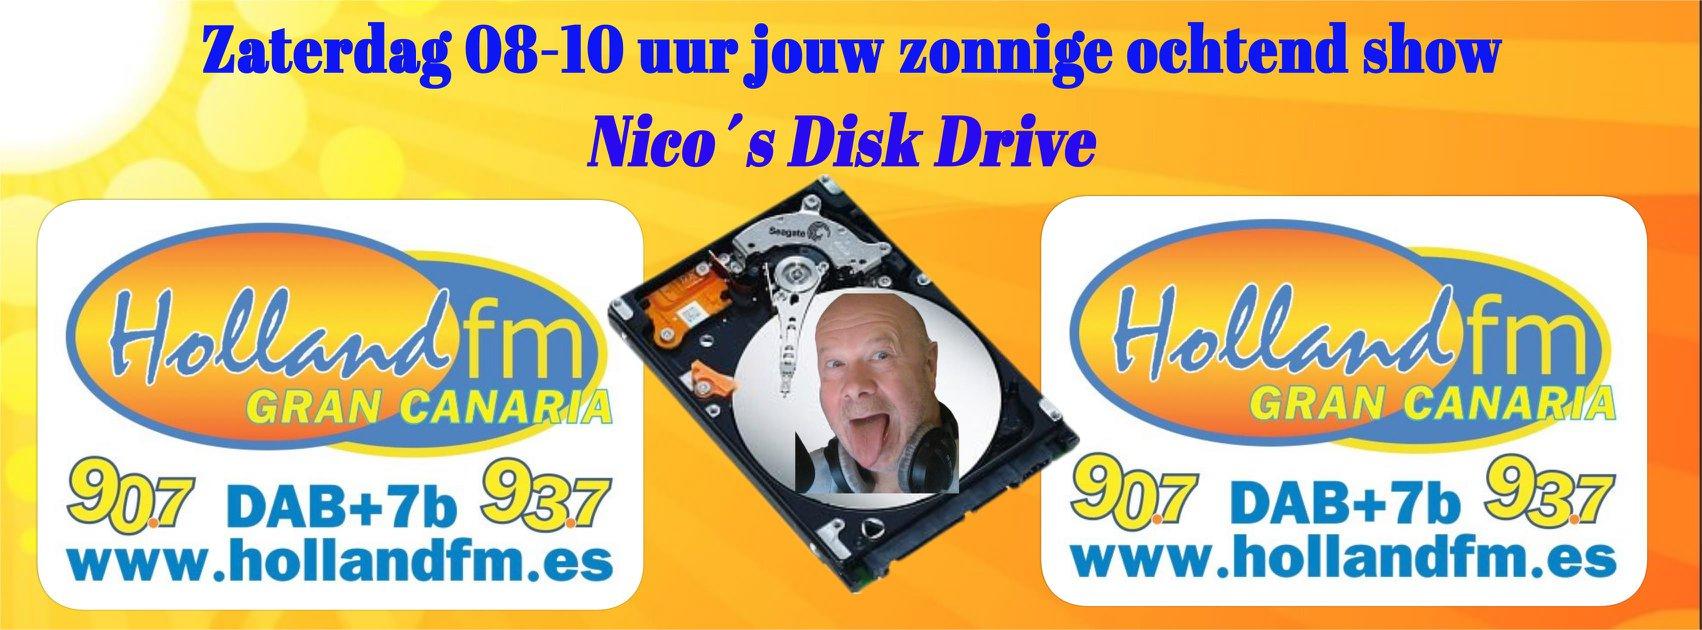 Nico's Disk Drive